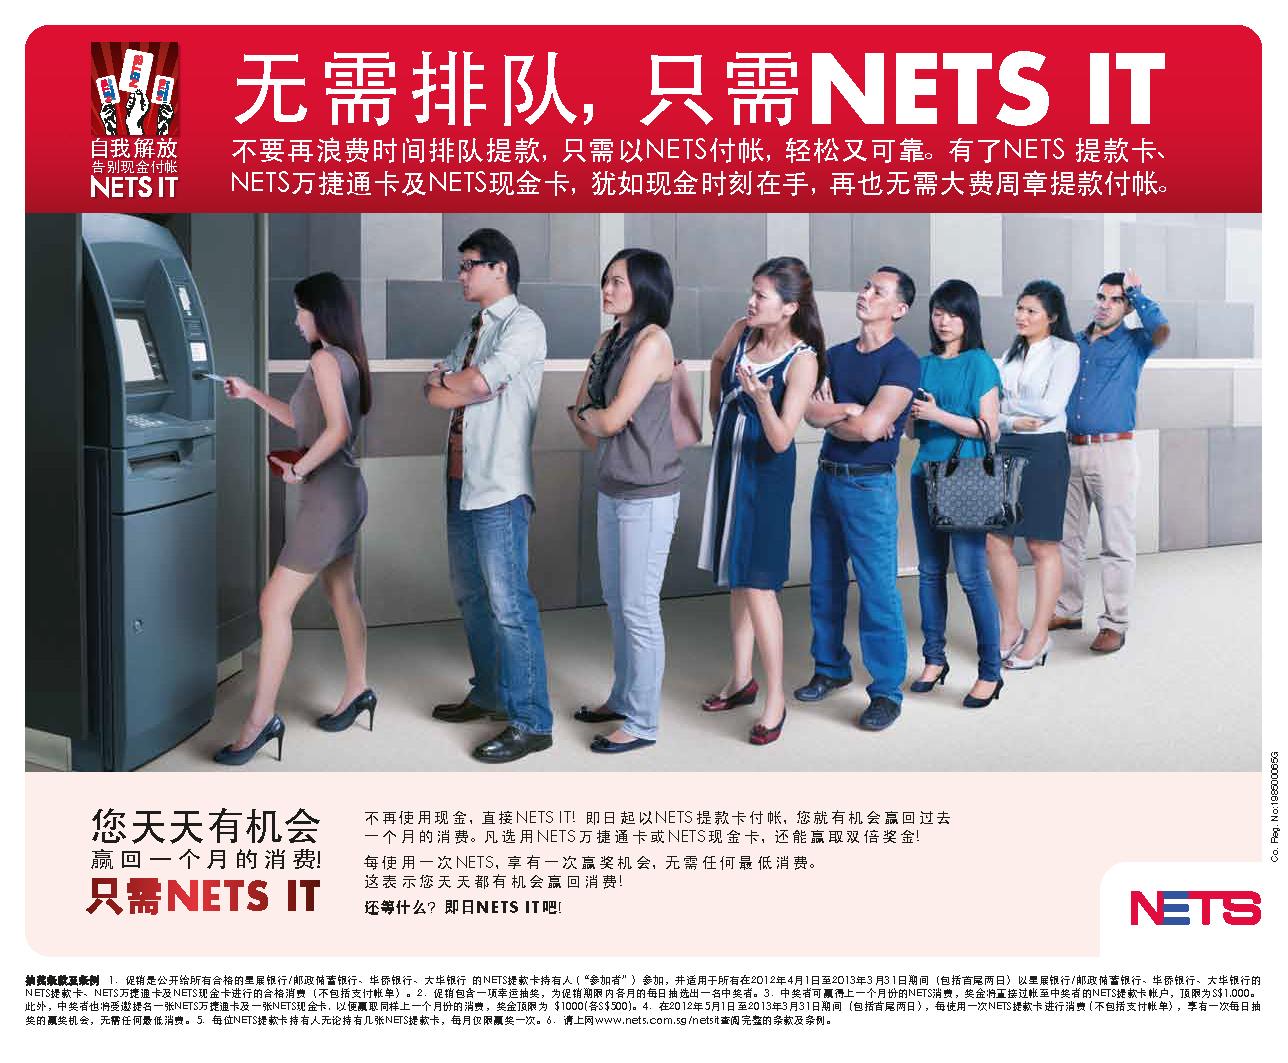 NETS0011-12 NETS LHZB Ad R7.jpg